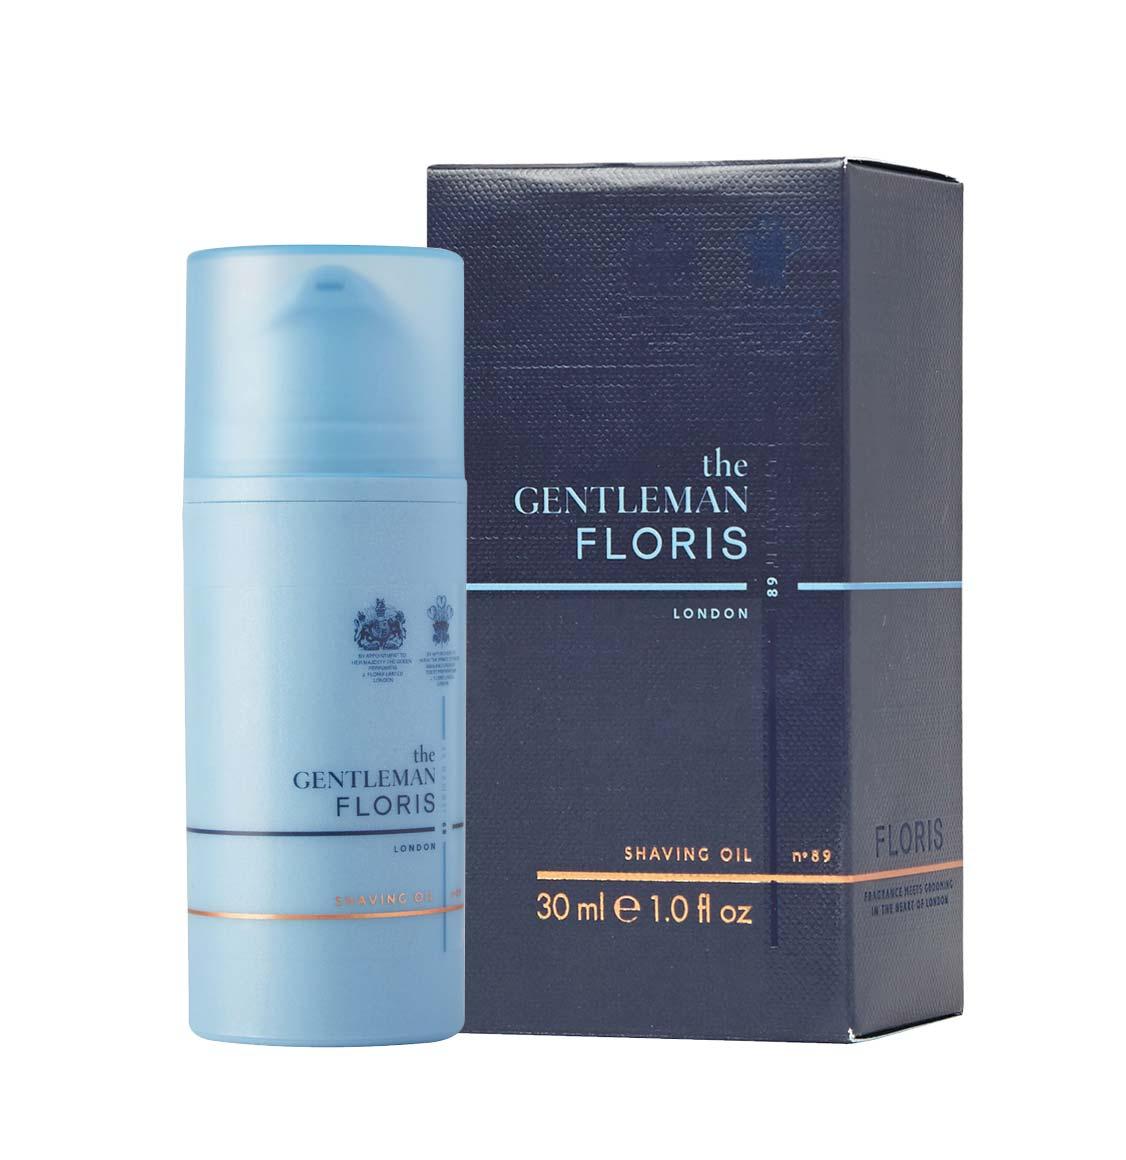 Floris London No. 89 Shaving Oil 30ml